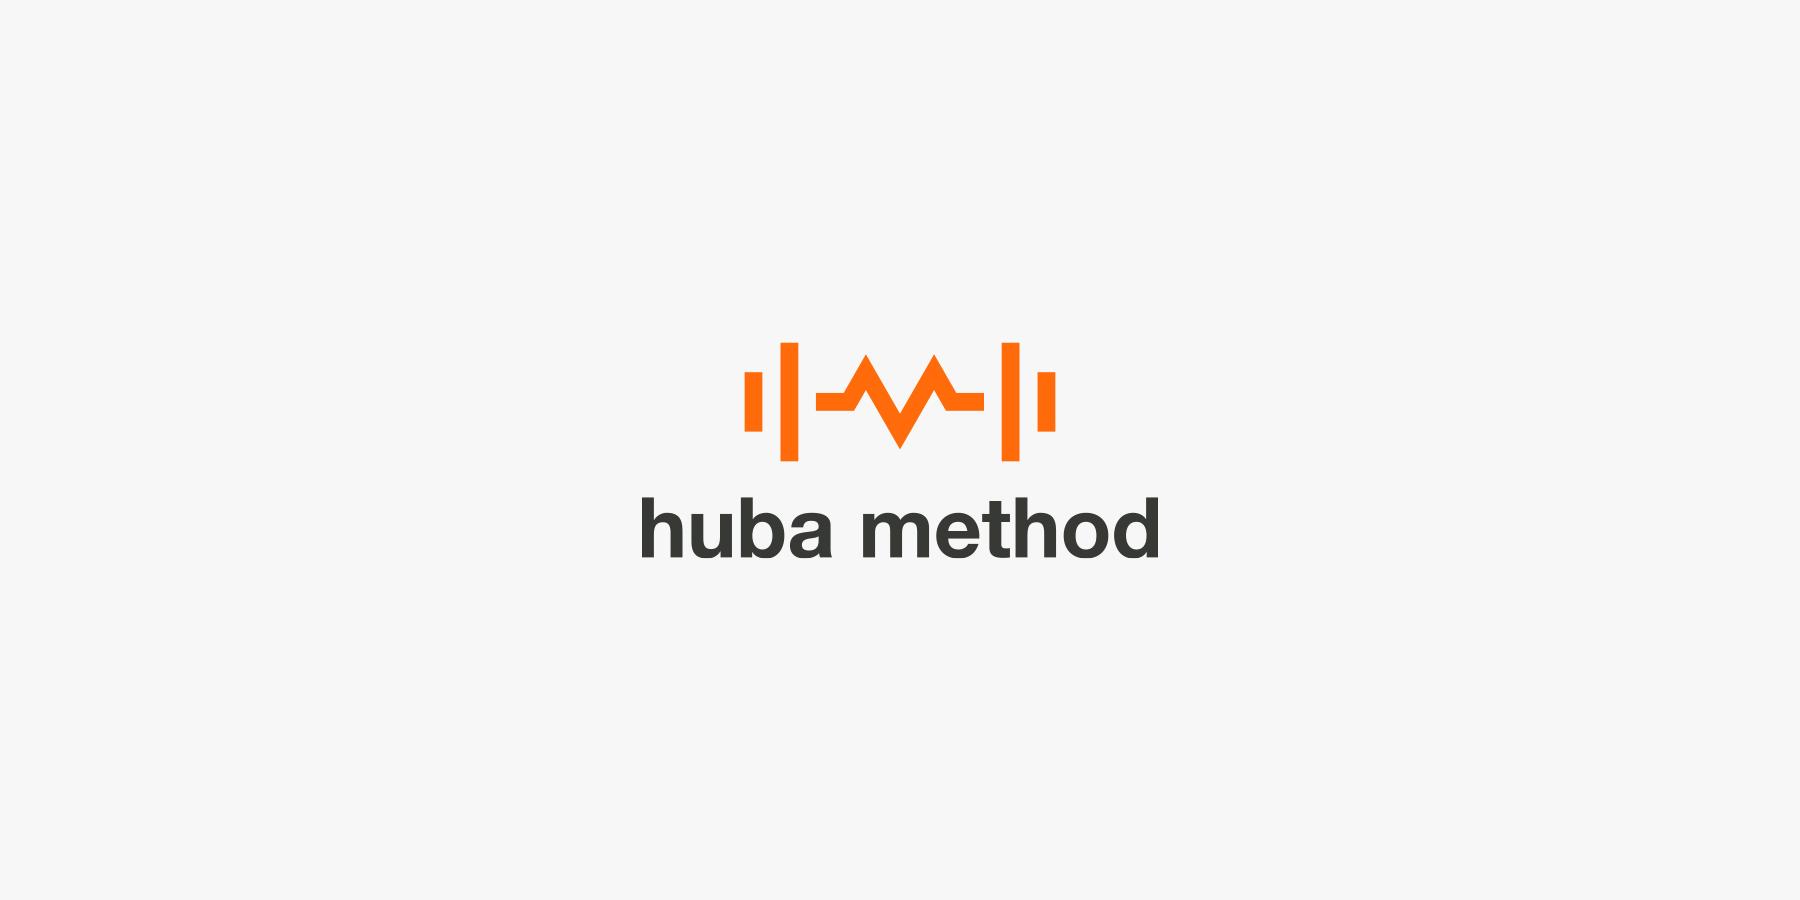 huba-method-logo-design-01